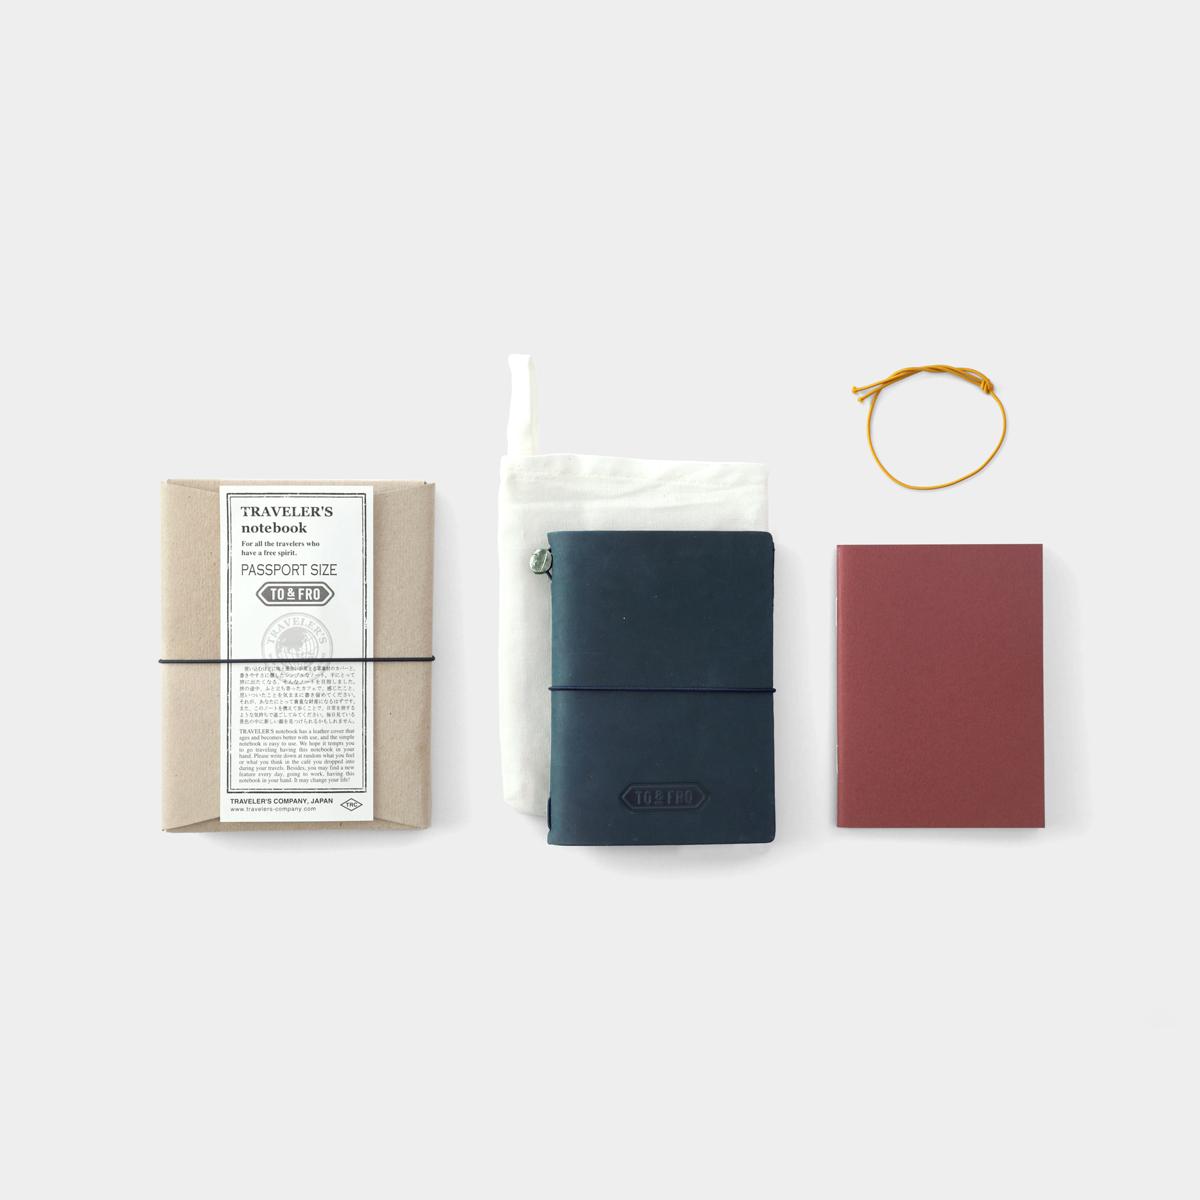 【TO&FRO×TRAVELER'S COMPANY】TO&FROトラベラーズノート パスポートサイズ